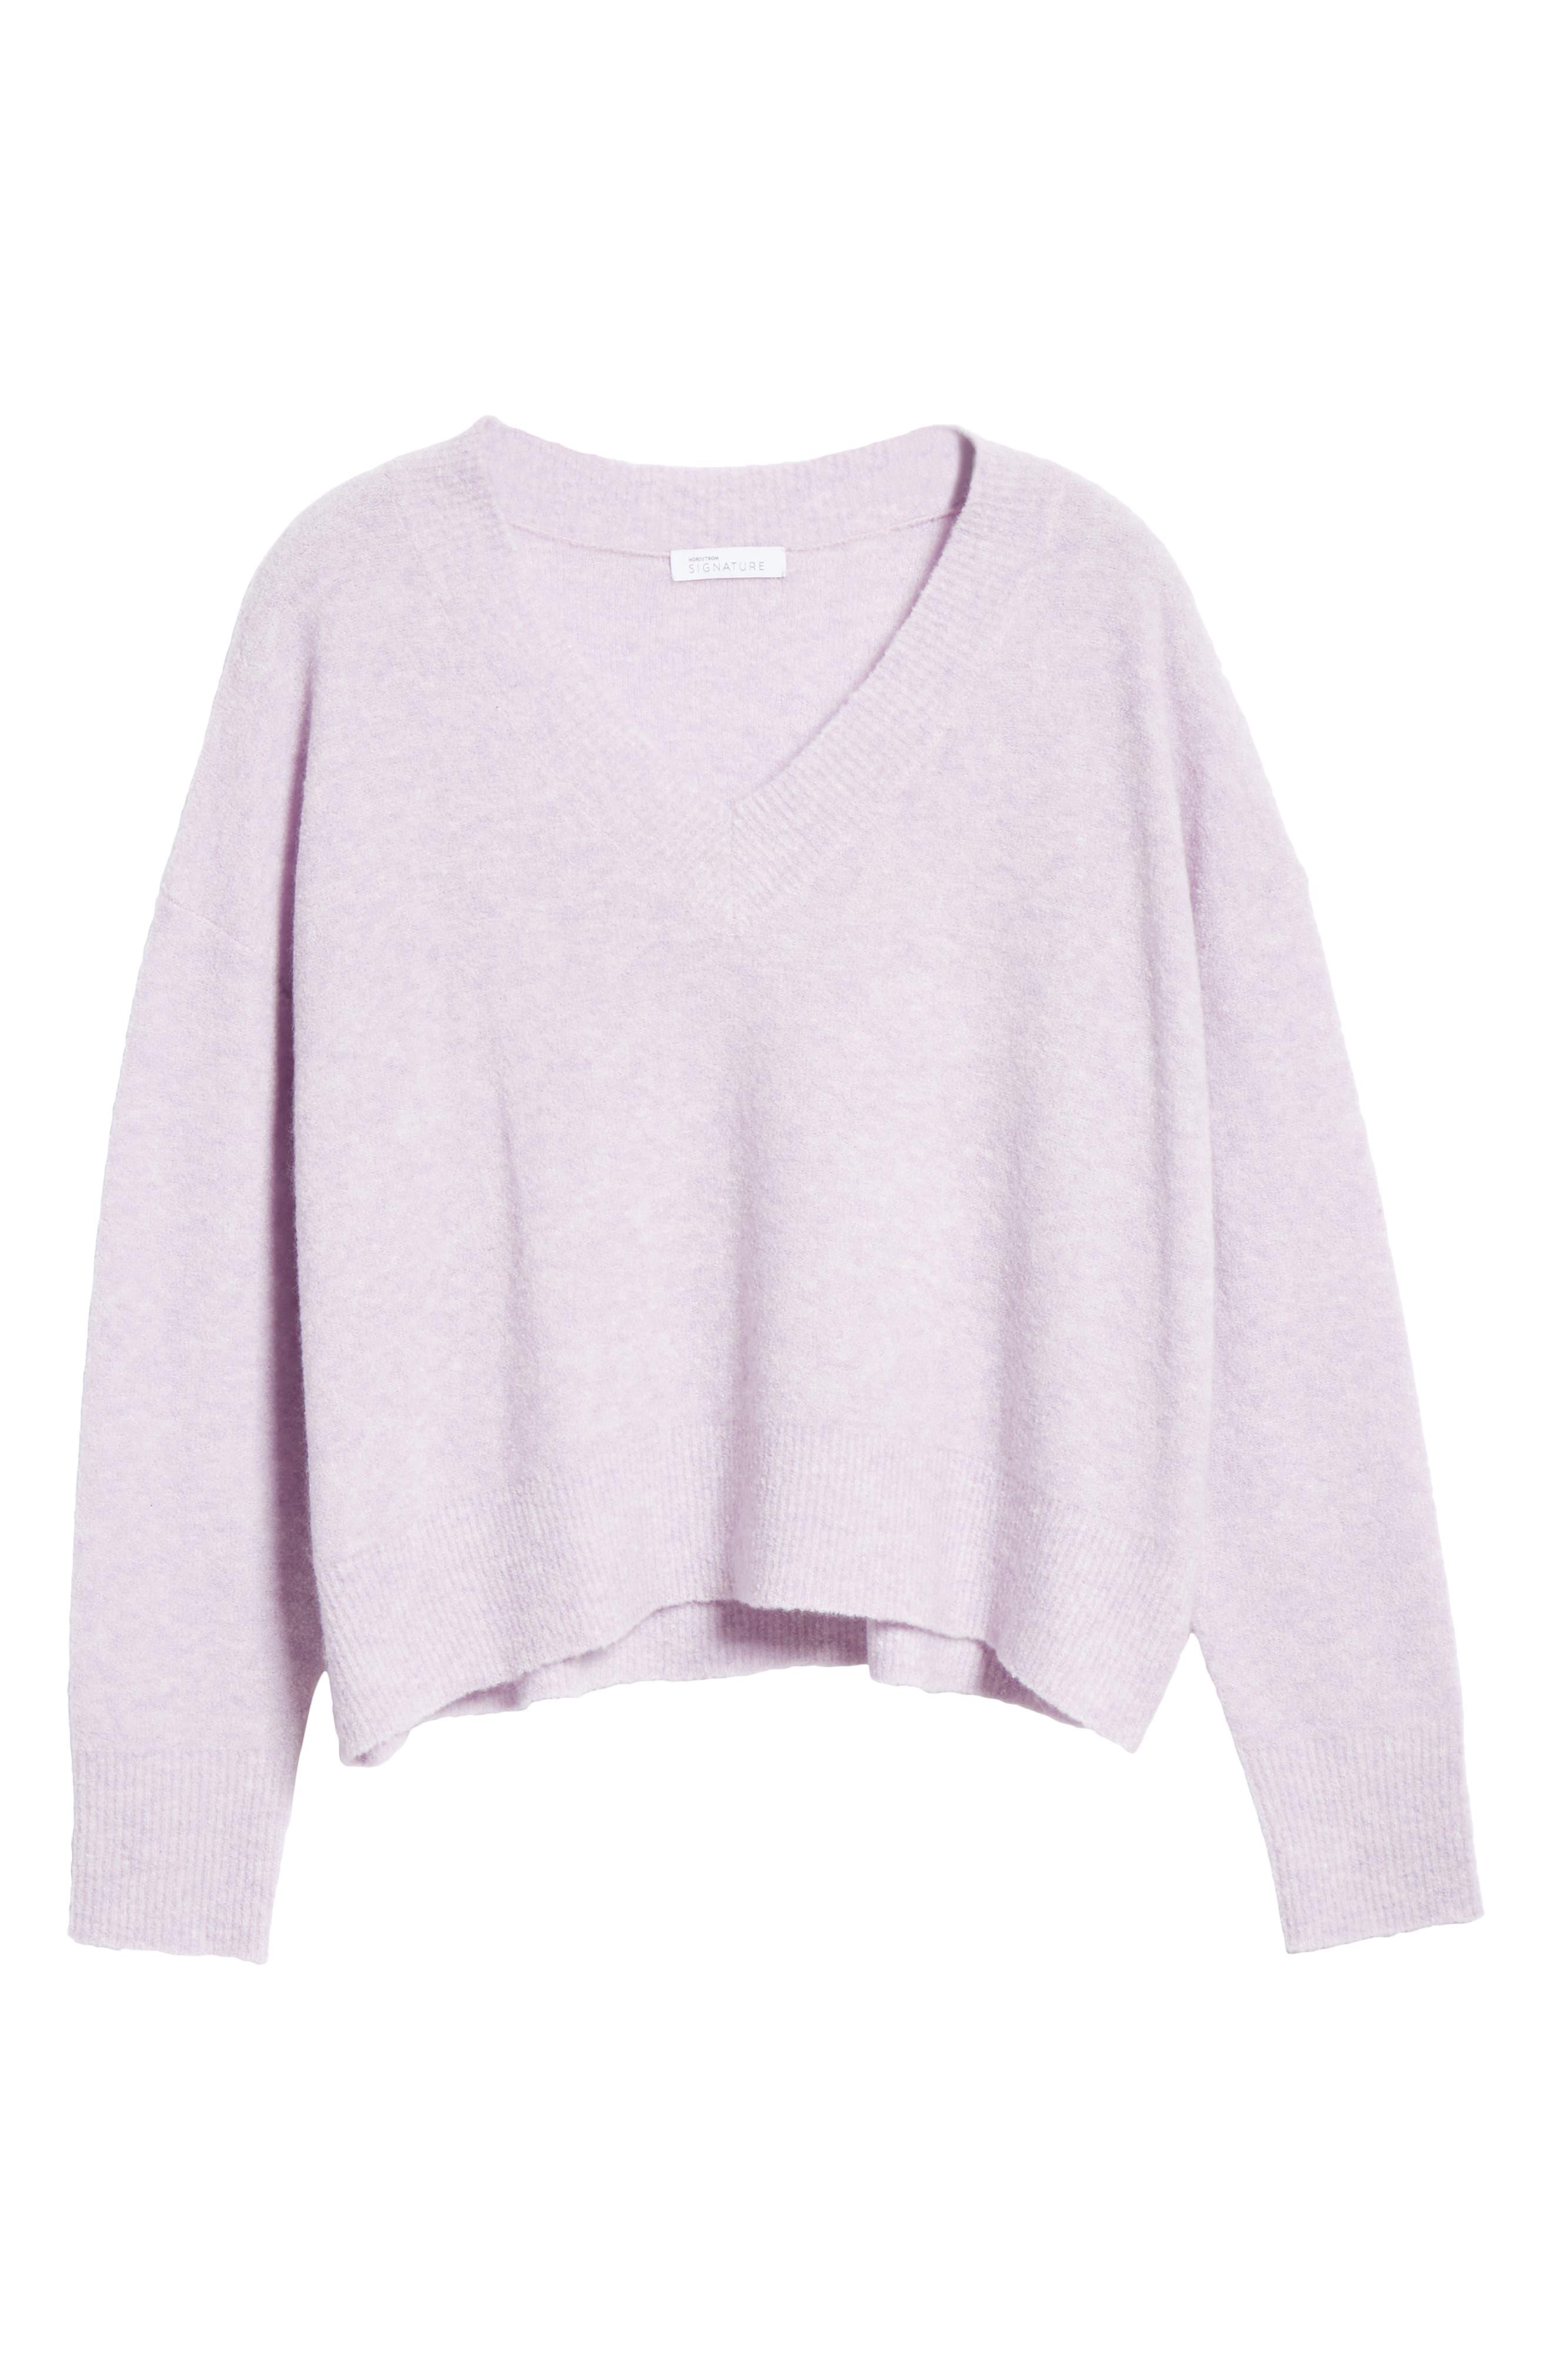 Cashmere Blend Bouclé Sweater,                             Alternate thumbnail 6, color,                             PURPLE HEIRLOOM HEATHER